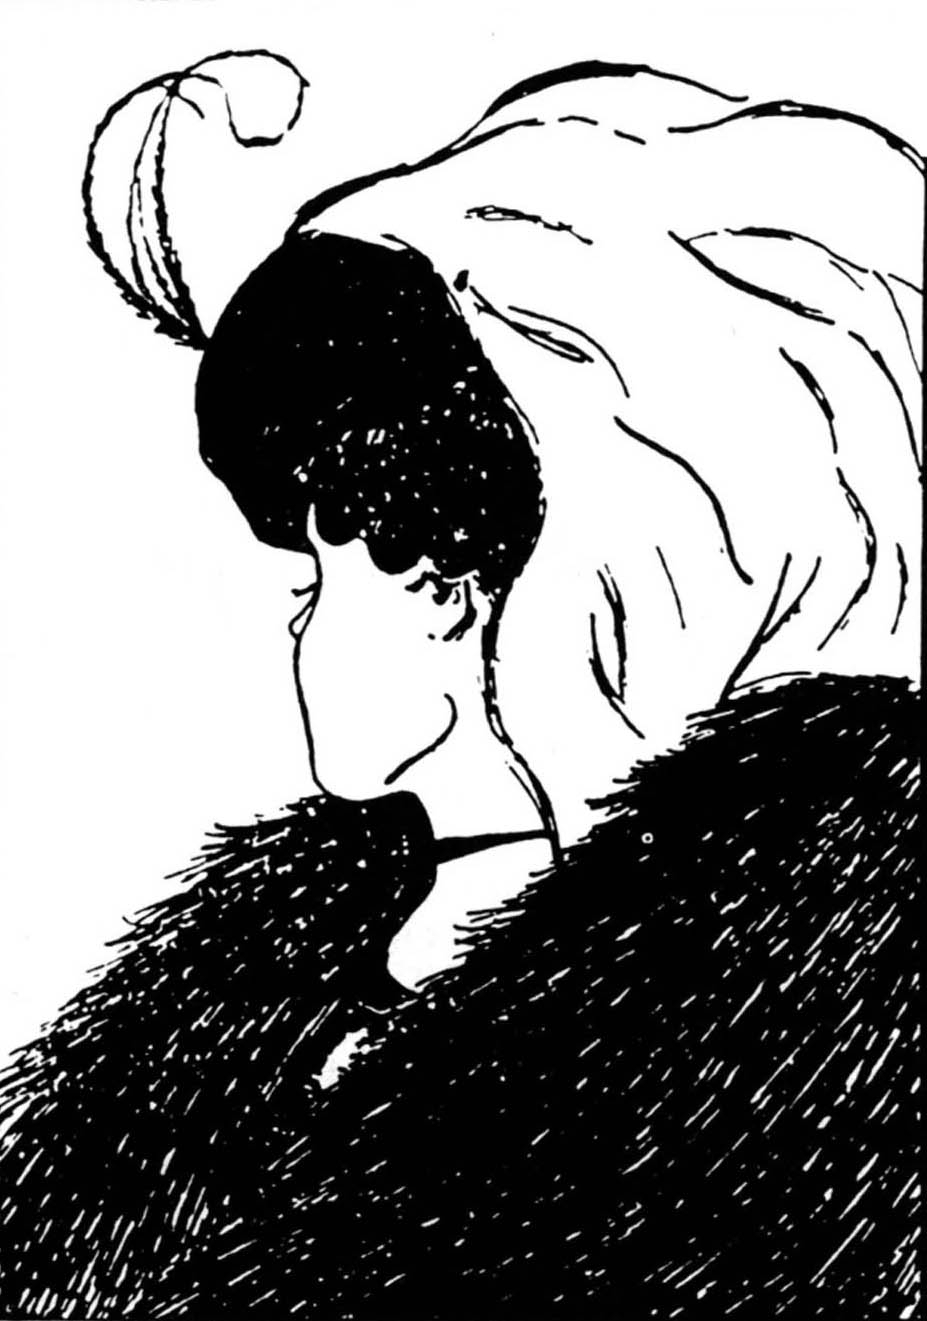 Drawn optical illusion badass Anime badass Old Drawing Woman